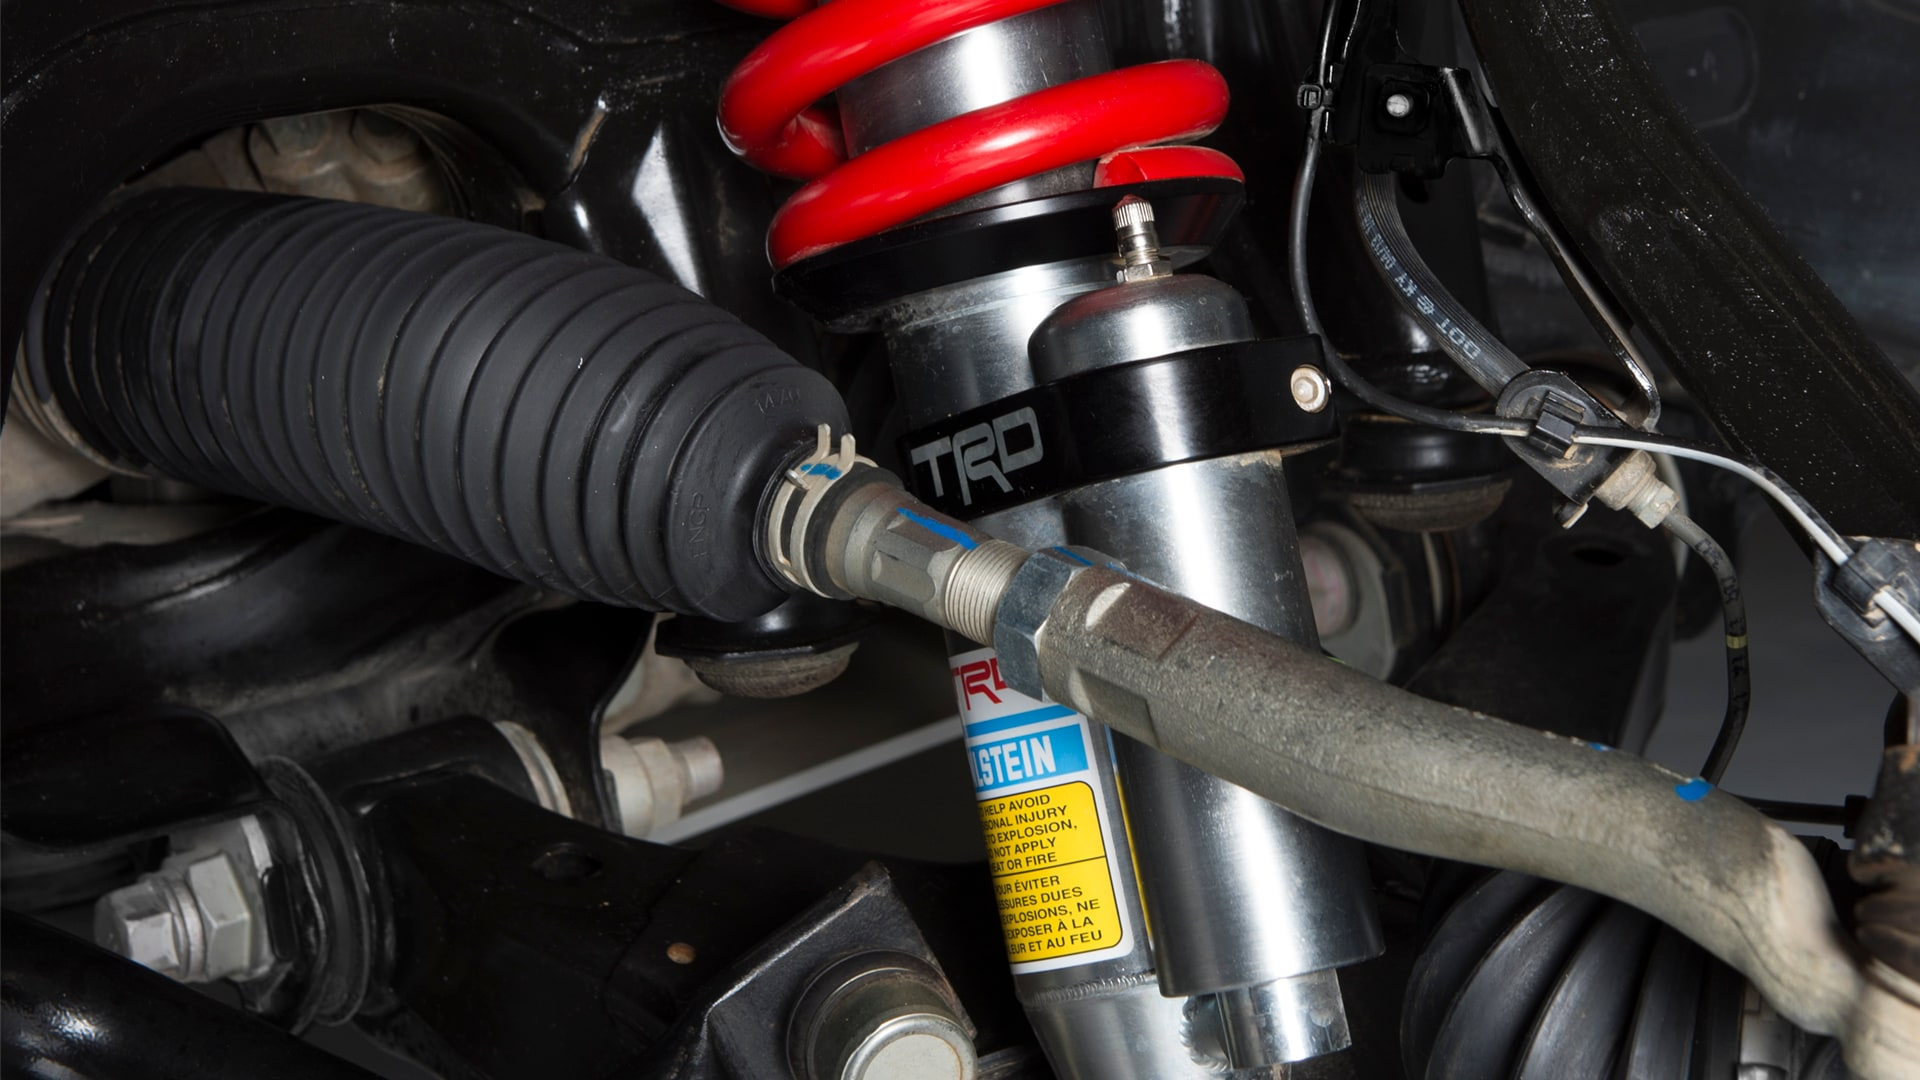 Trd Pro Tundra >> 2015 TRD Pro Series | Toyota Tundra in Arkansas | Steve Landers Toyota of Little Rock